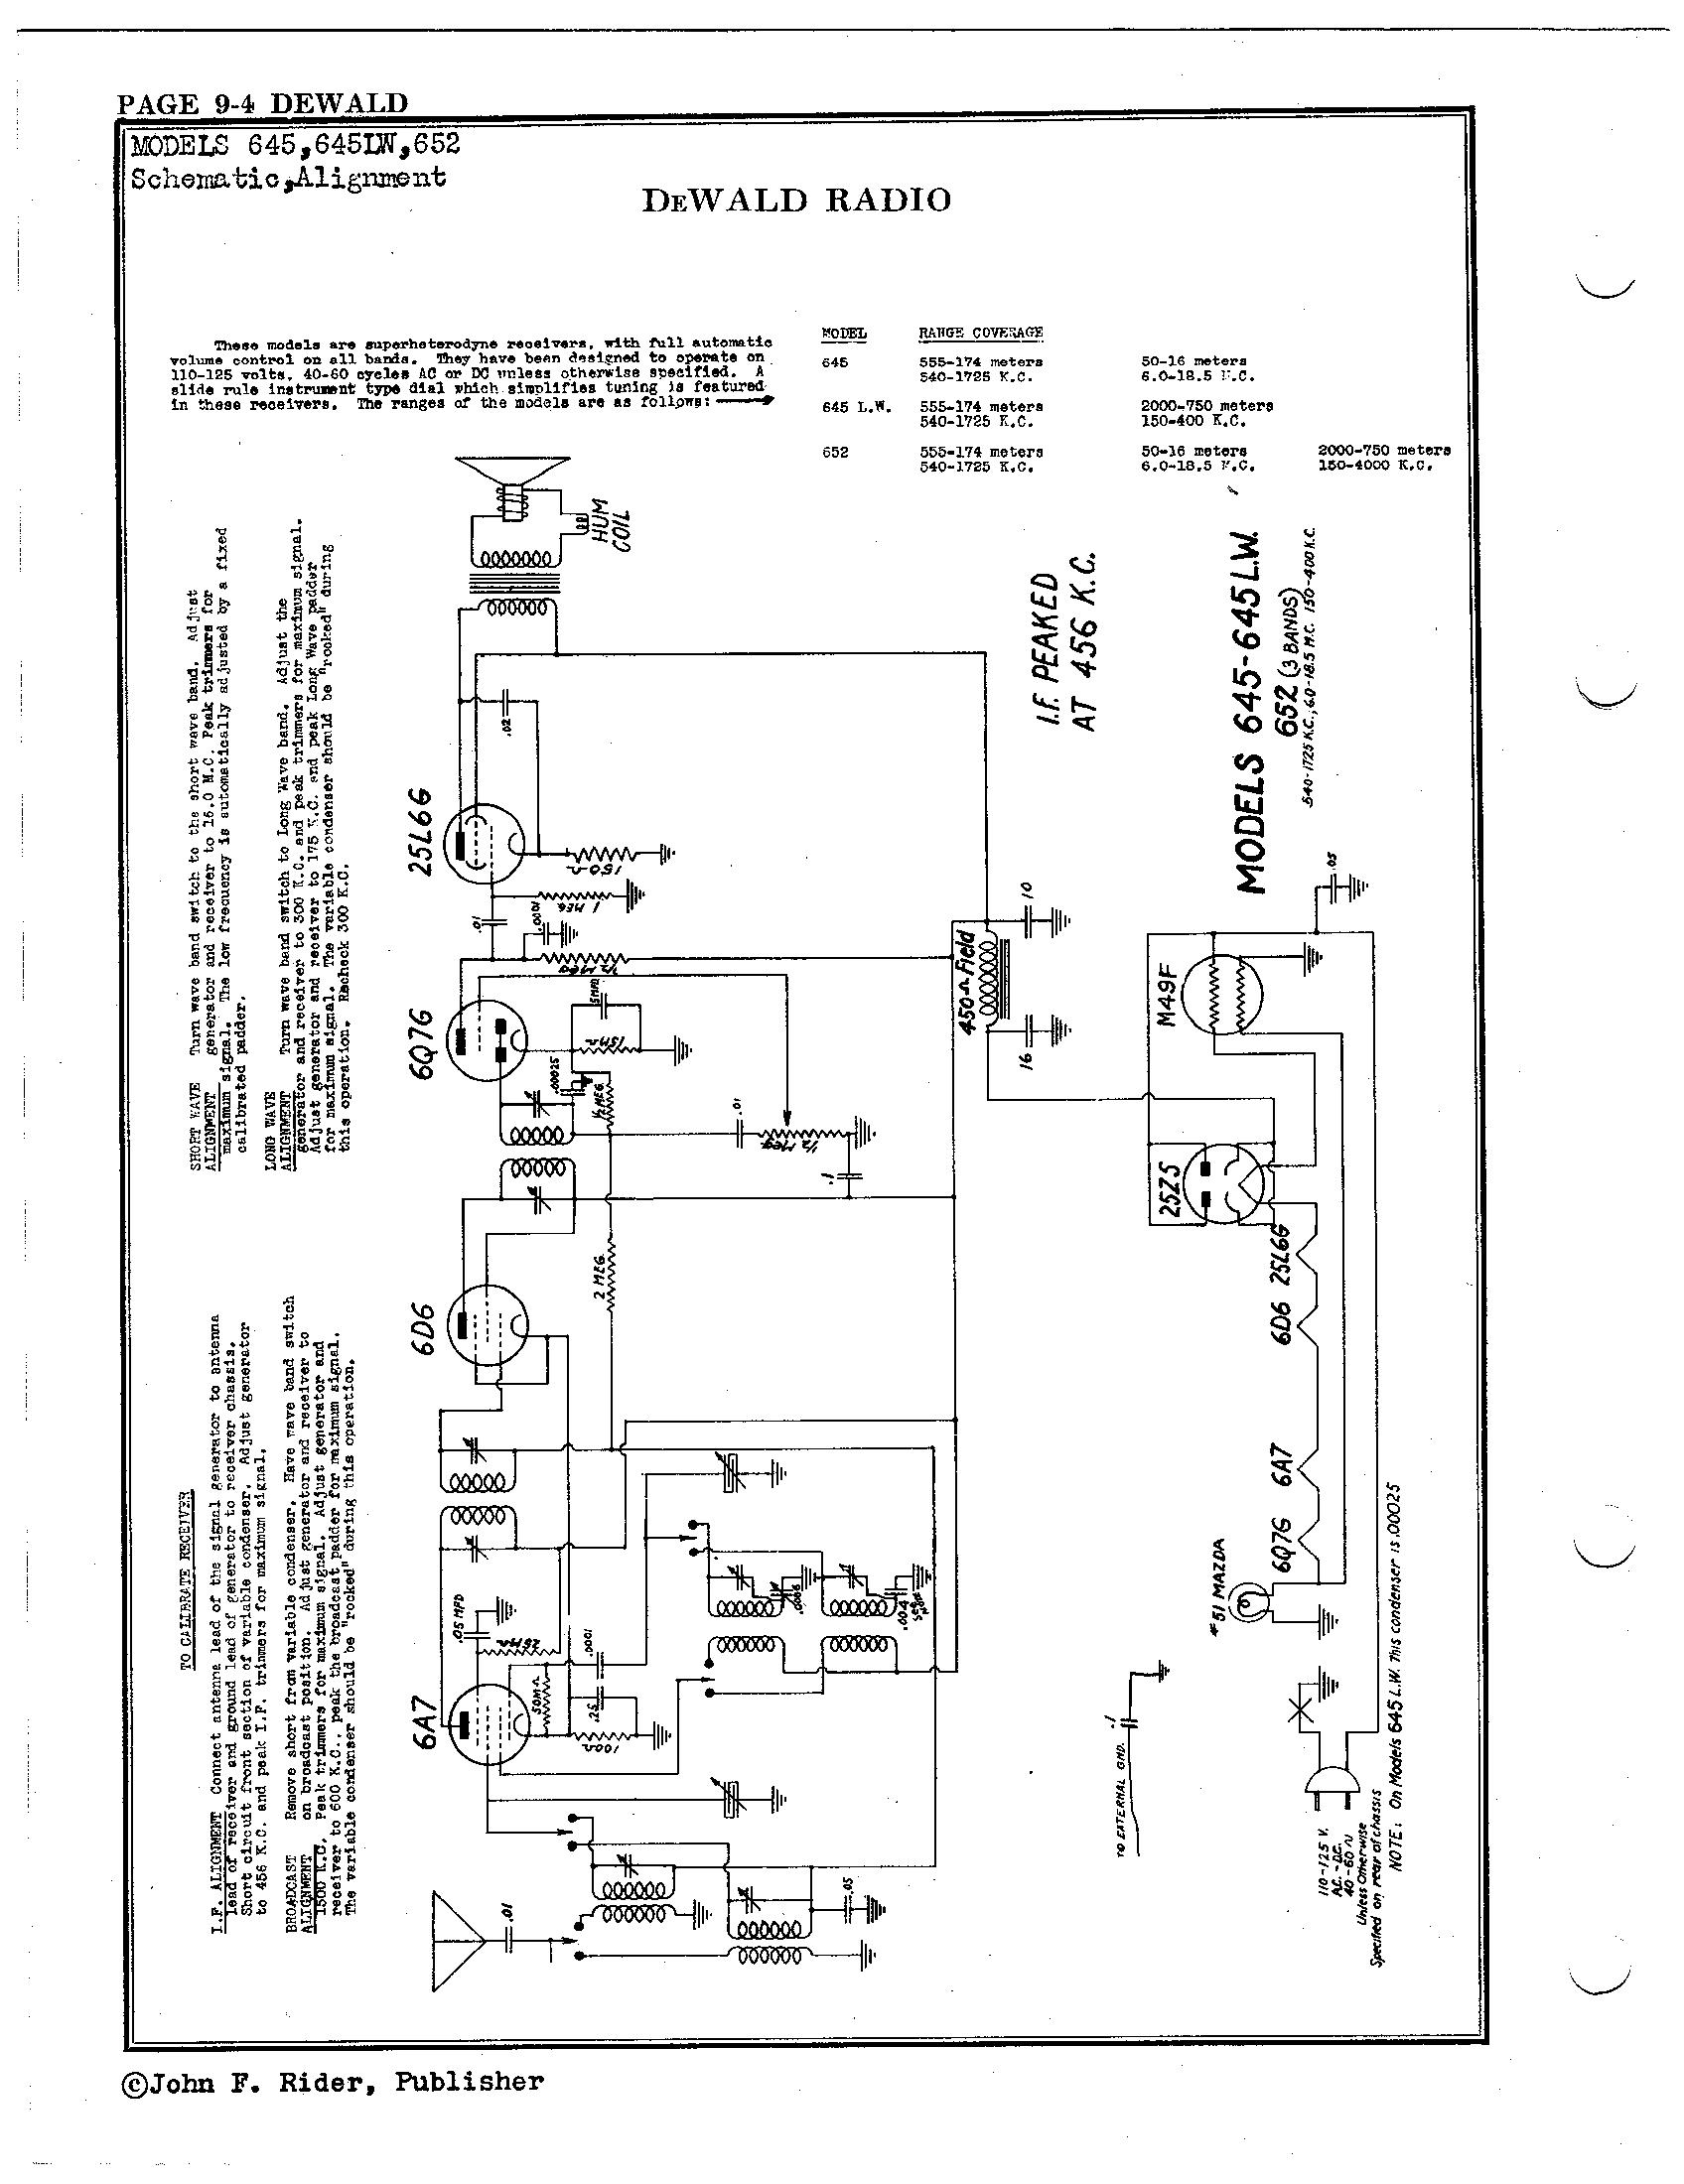 dewald radio mfg  corp  652